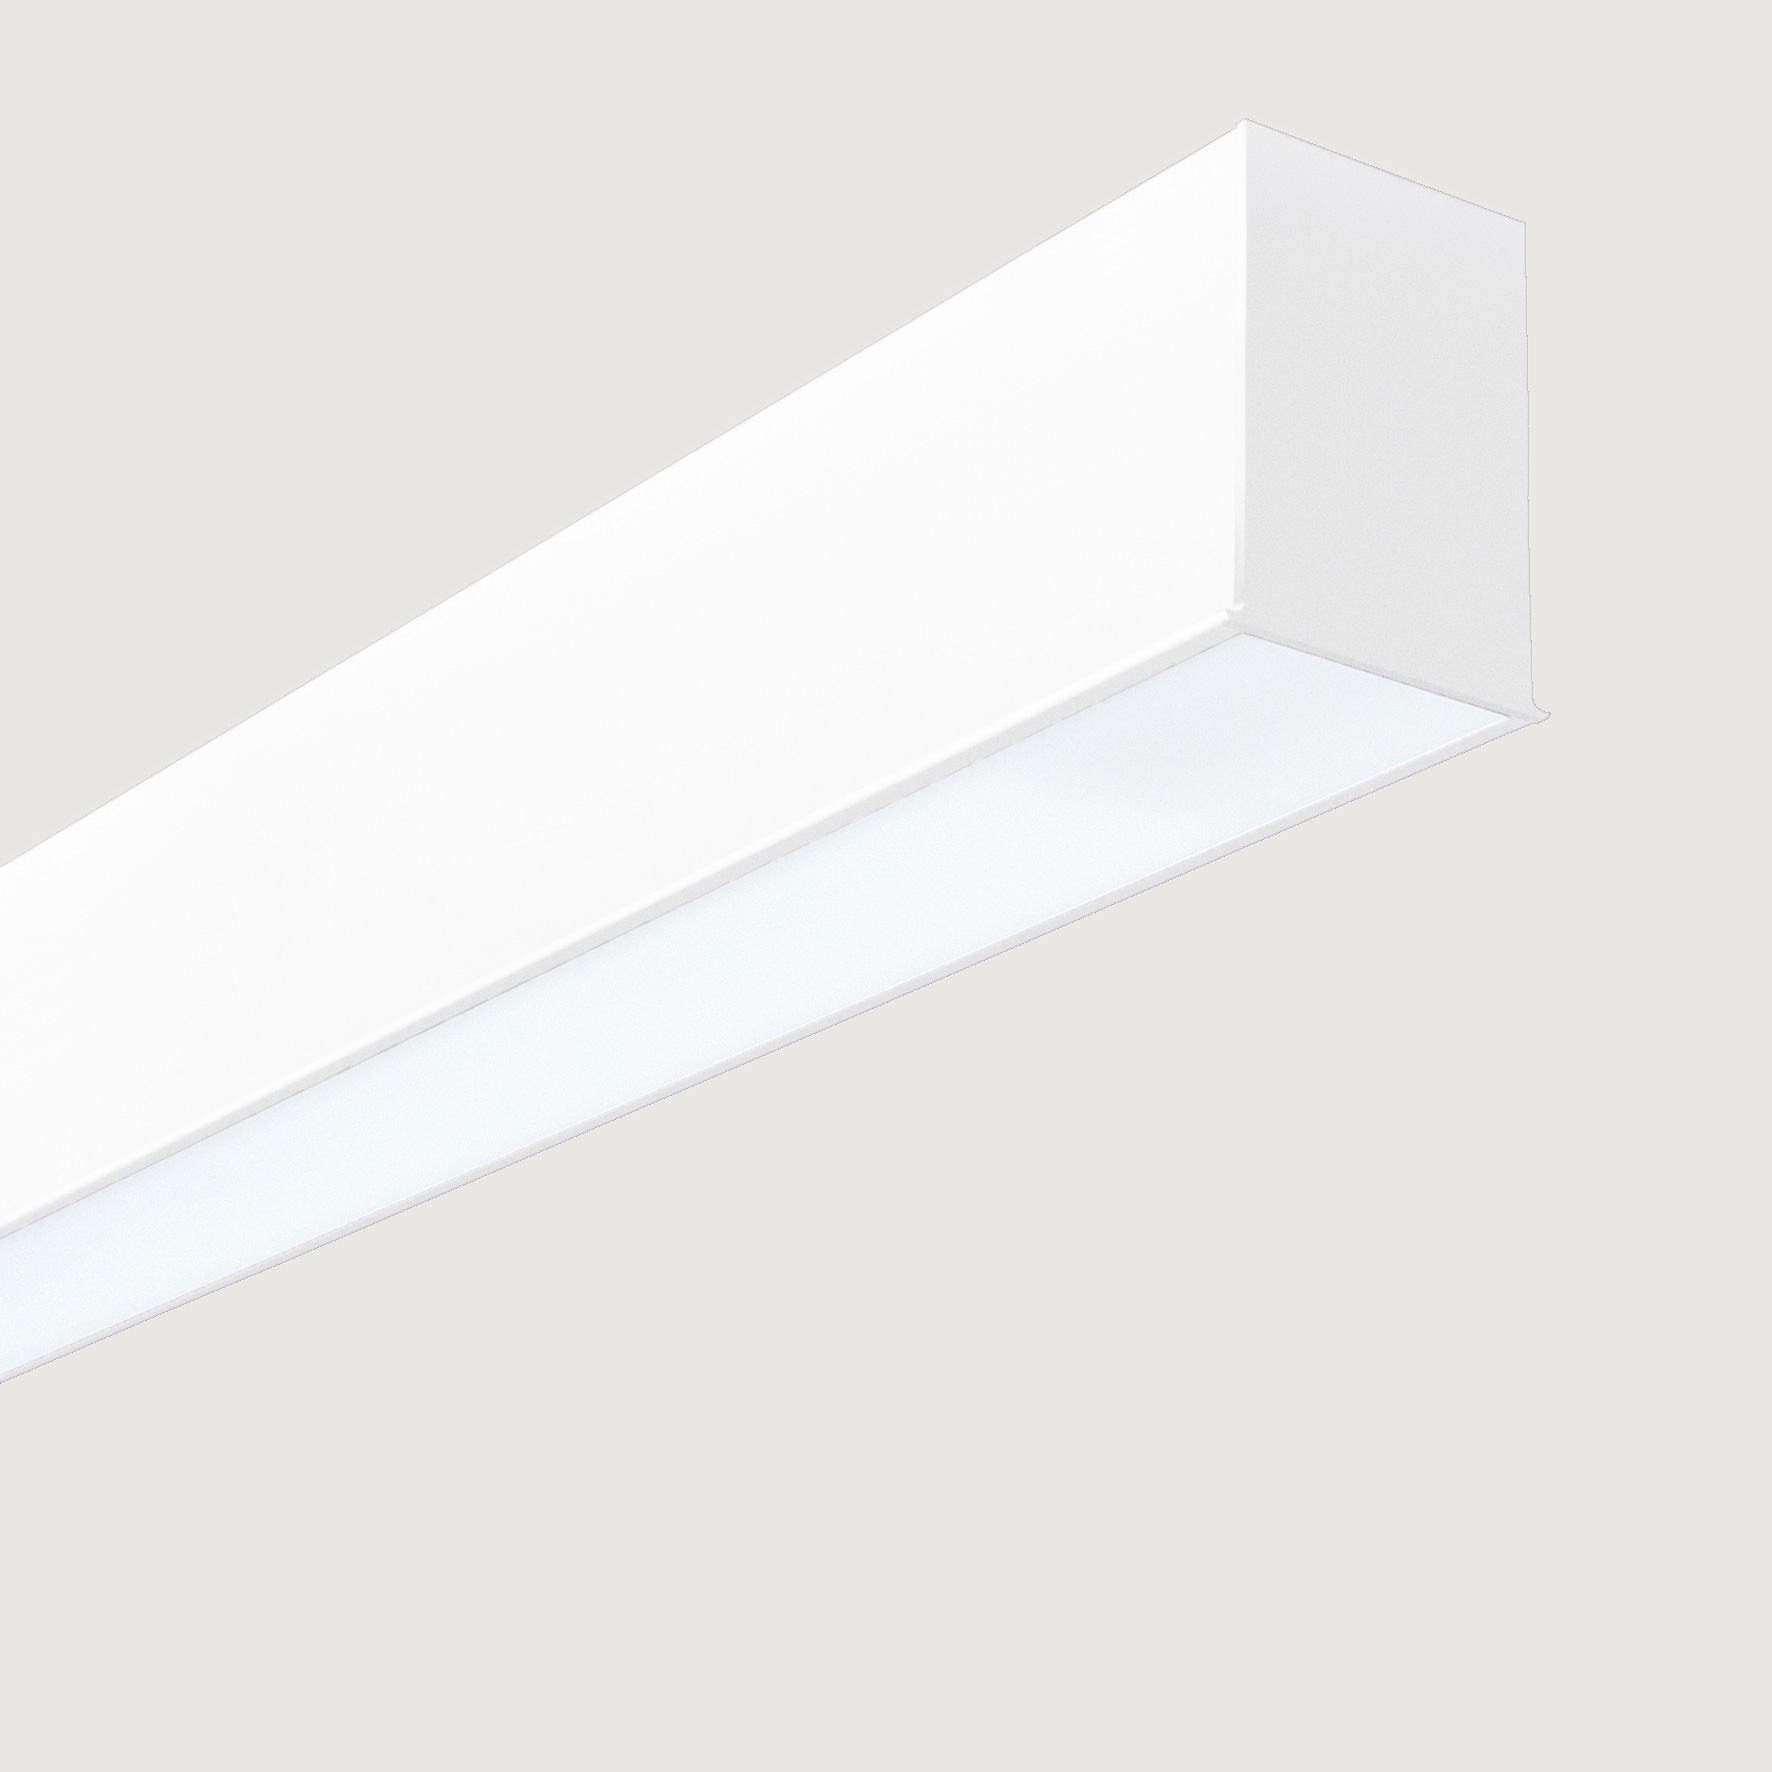 SE57-profilleuchte-weiß-sml-led